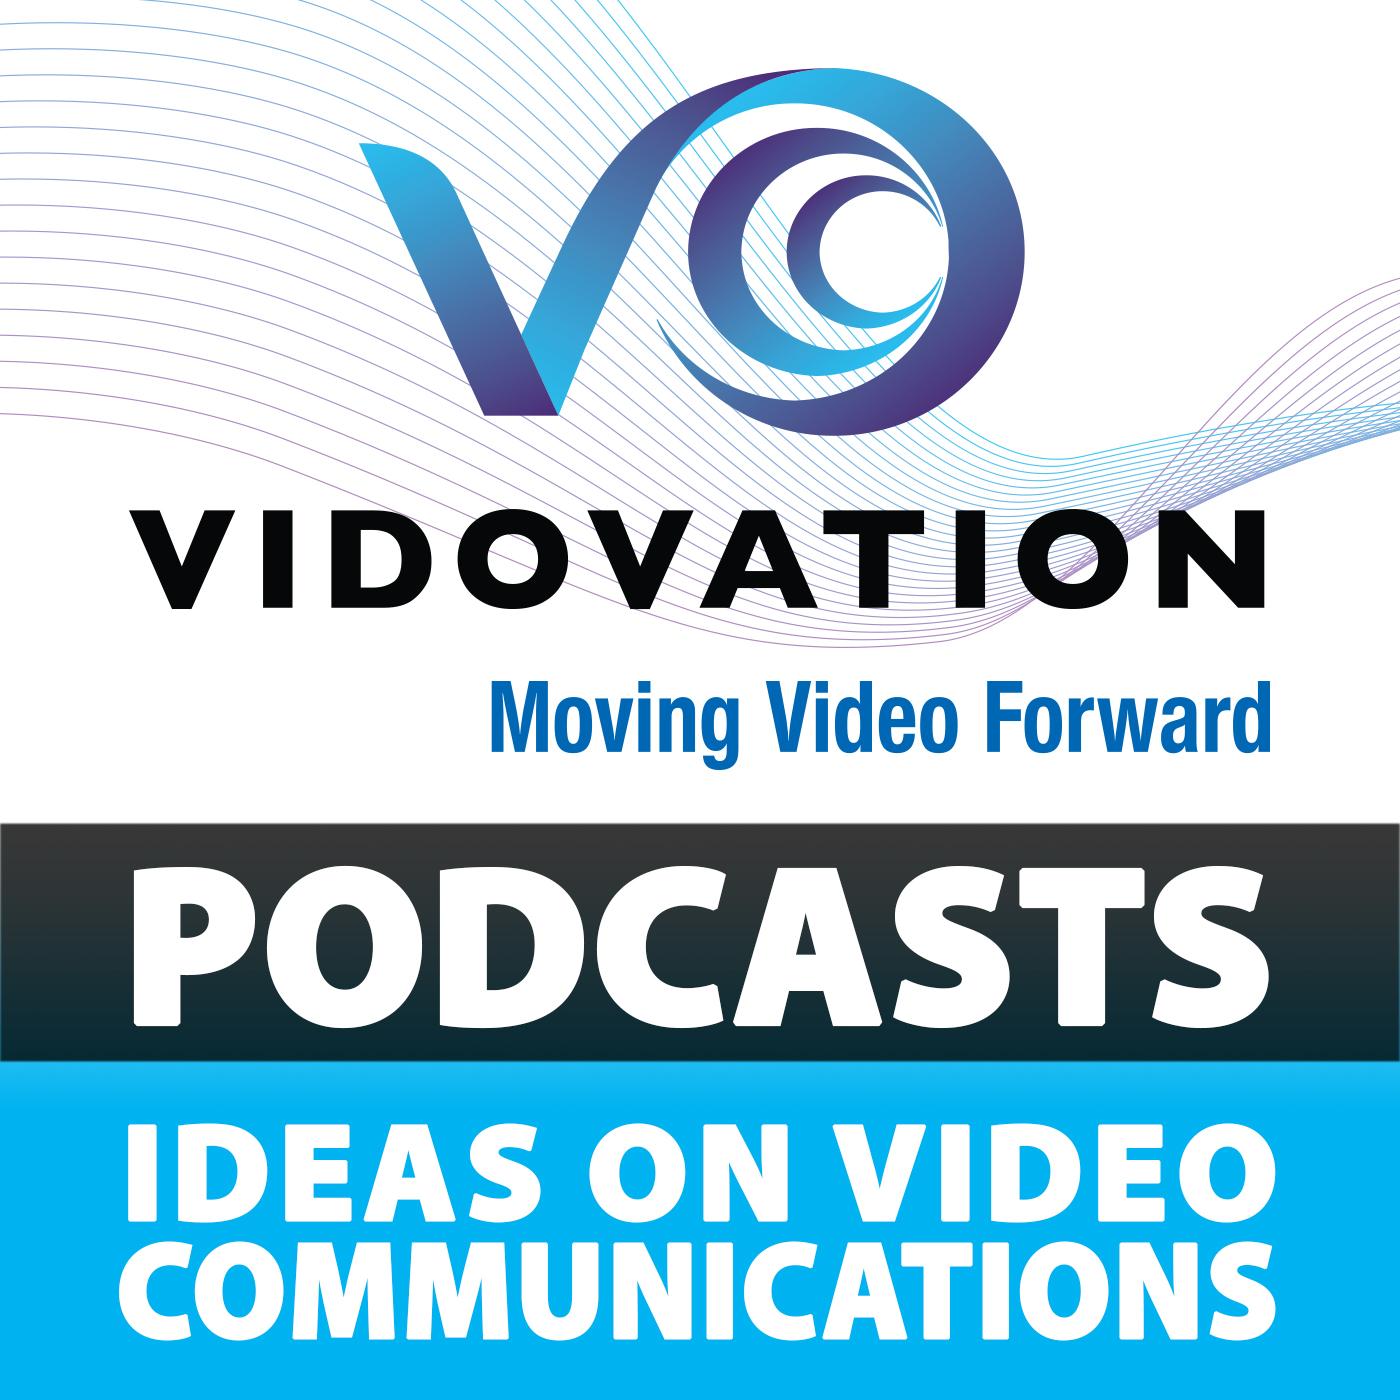 Ideas on Video Communications | Wireless | Cellular | Fiber Optics | IPTV | Video over IP